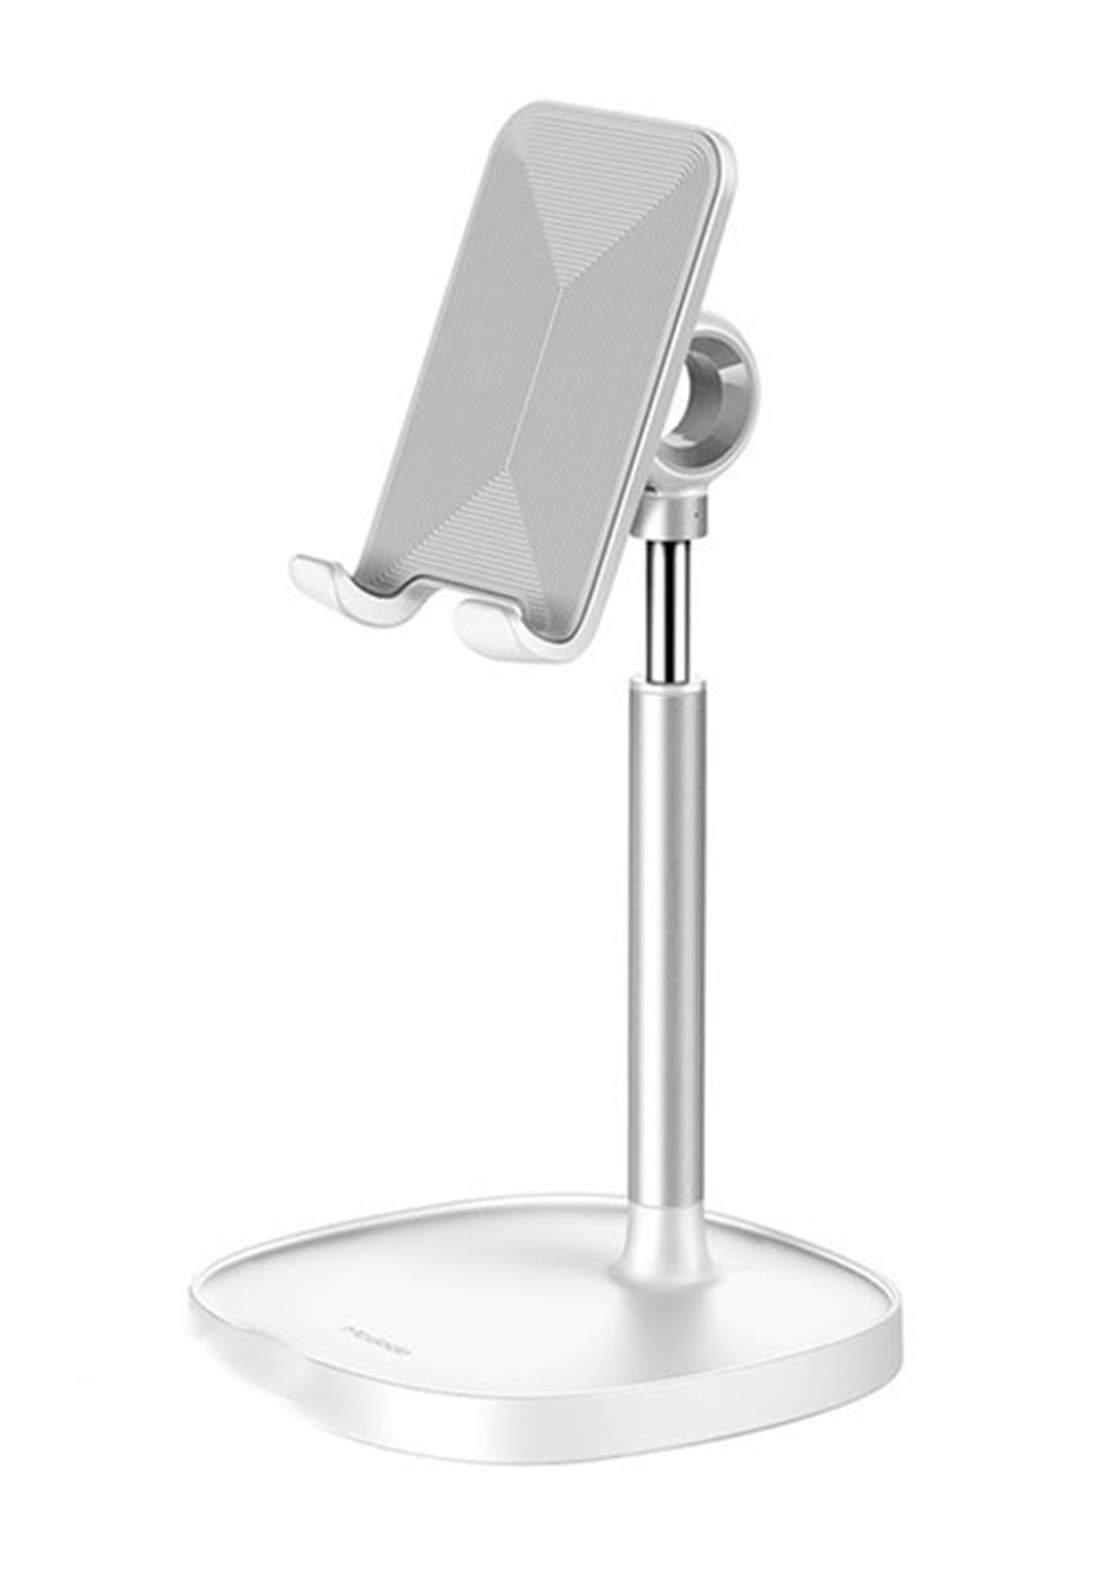 (12868)Mcdodo TB-7820 Pioneer Series Phone and Tablet Holder - White حامل موبايل